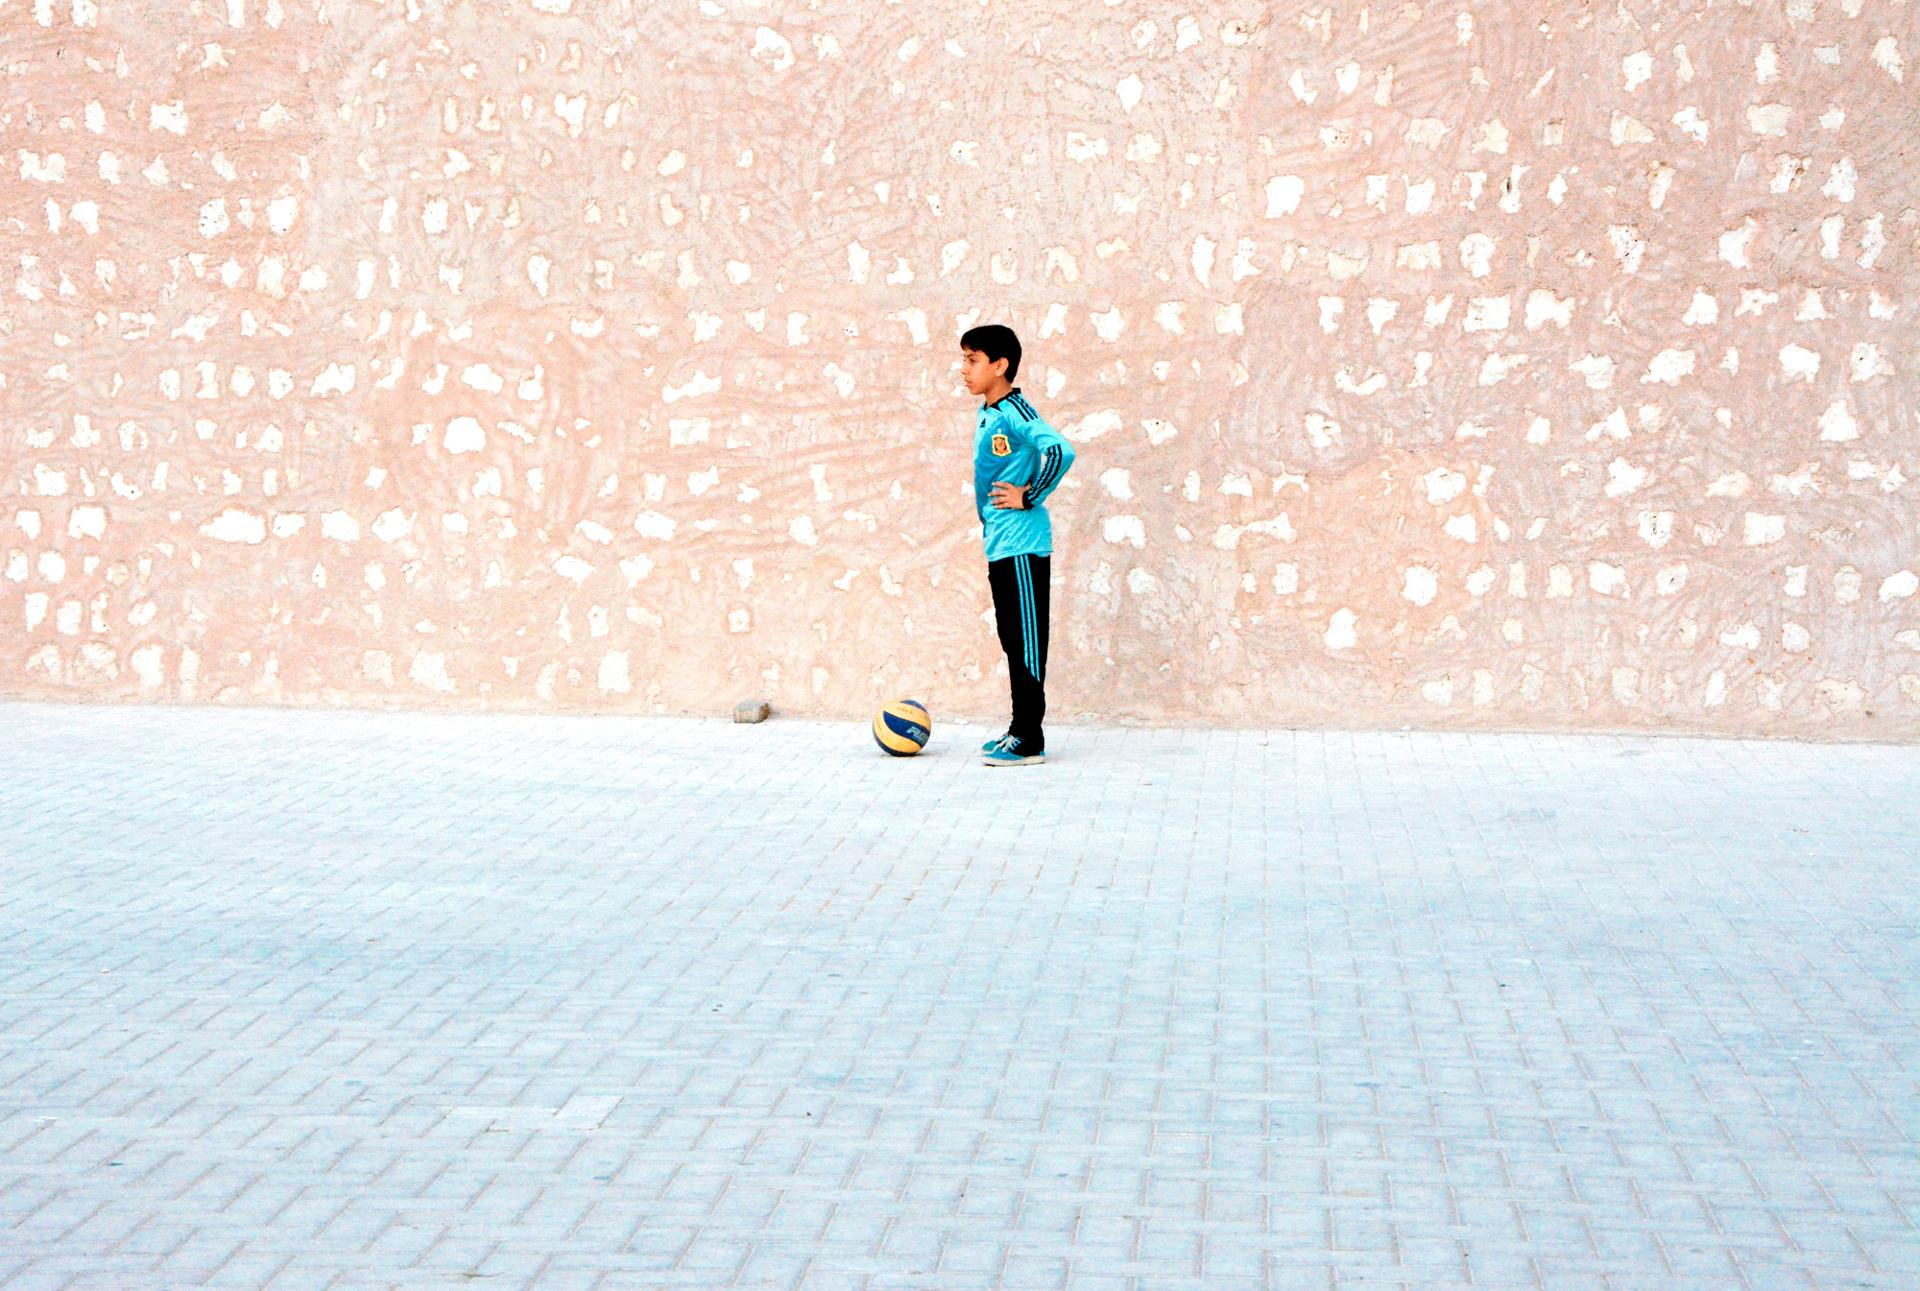 Soccer player in the street, Sharjarh, UAE